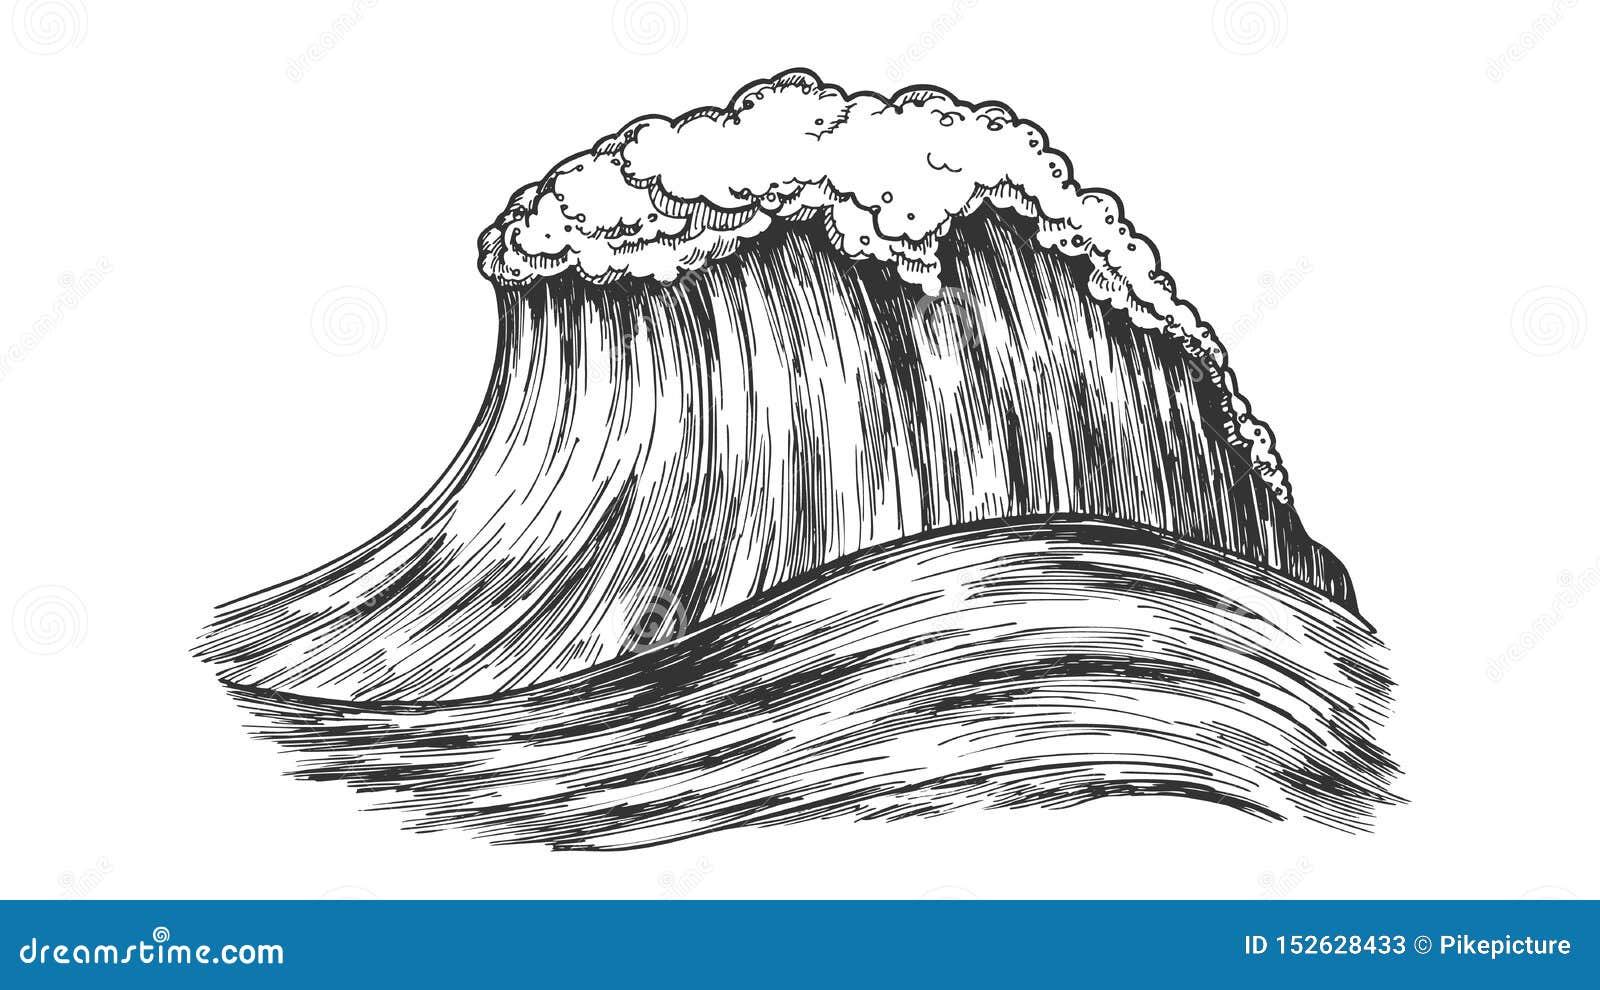 Big Foamy Tropical Ocean Marine Wave Storm Vector